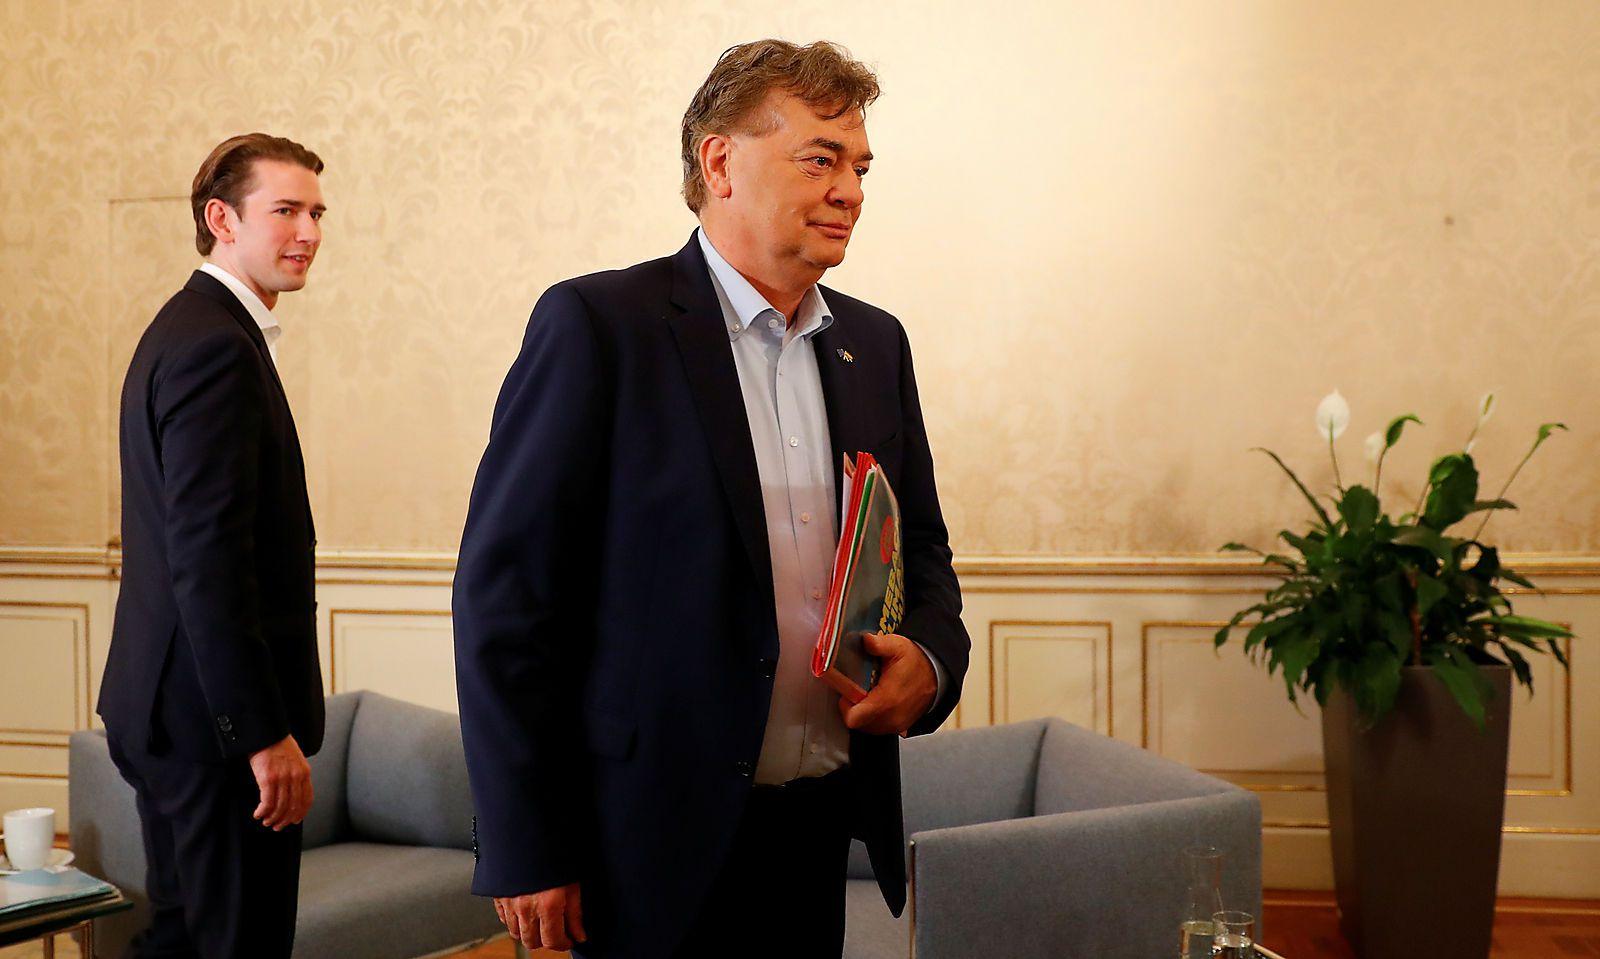 Head of OeVP Kurz meets head of Greens Kogler in Vienna